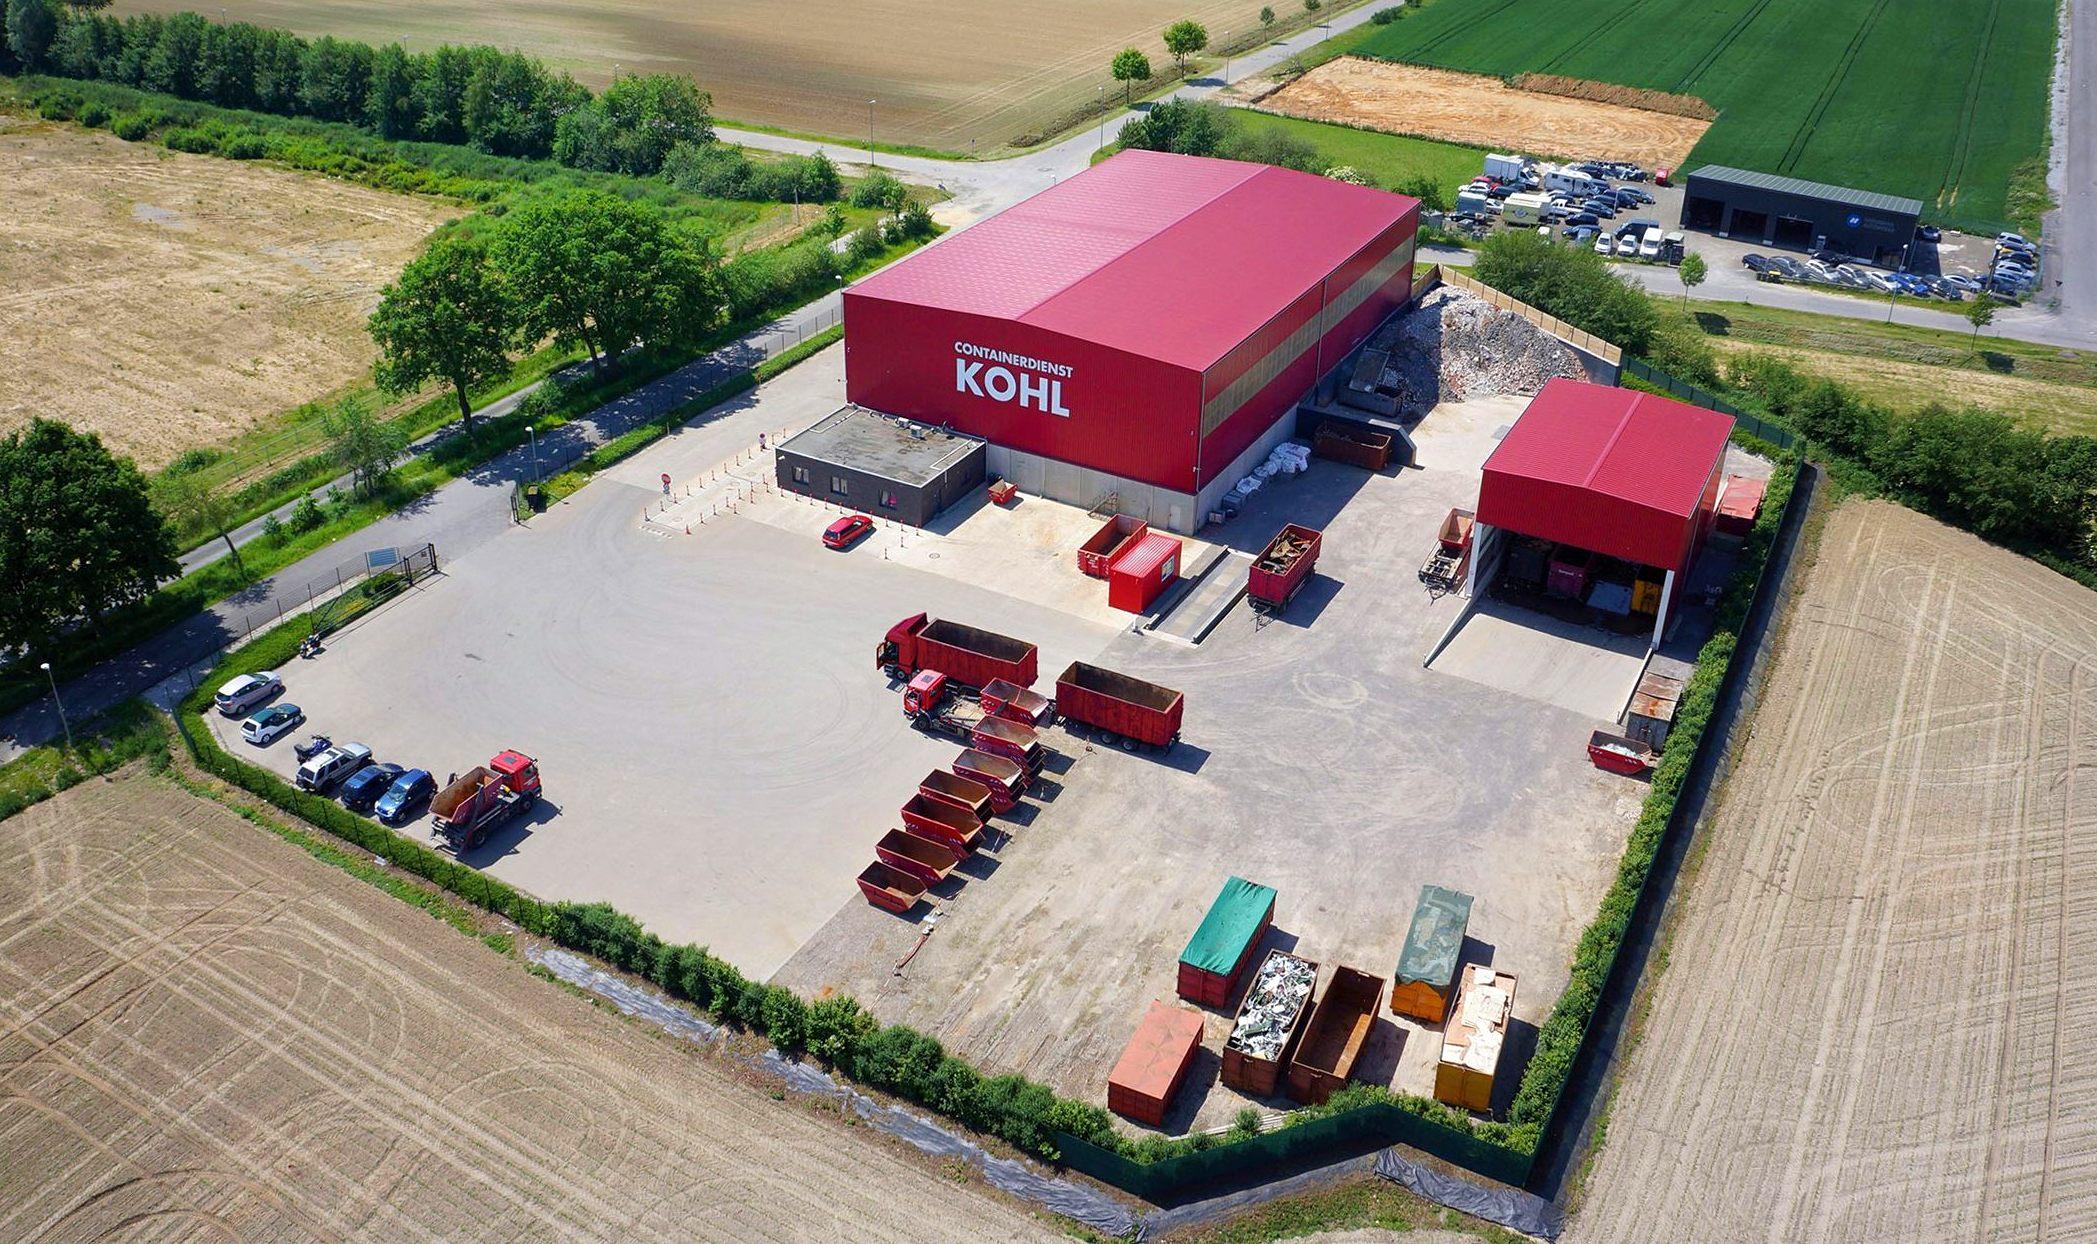 Kohl_Containerdienst_GmbH